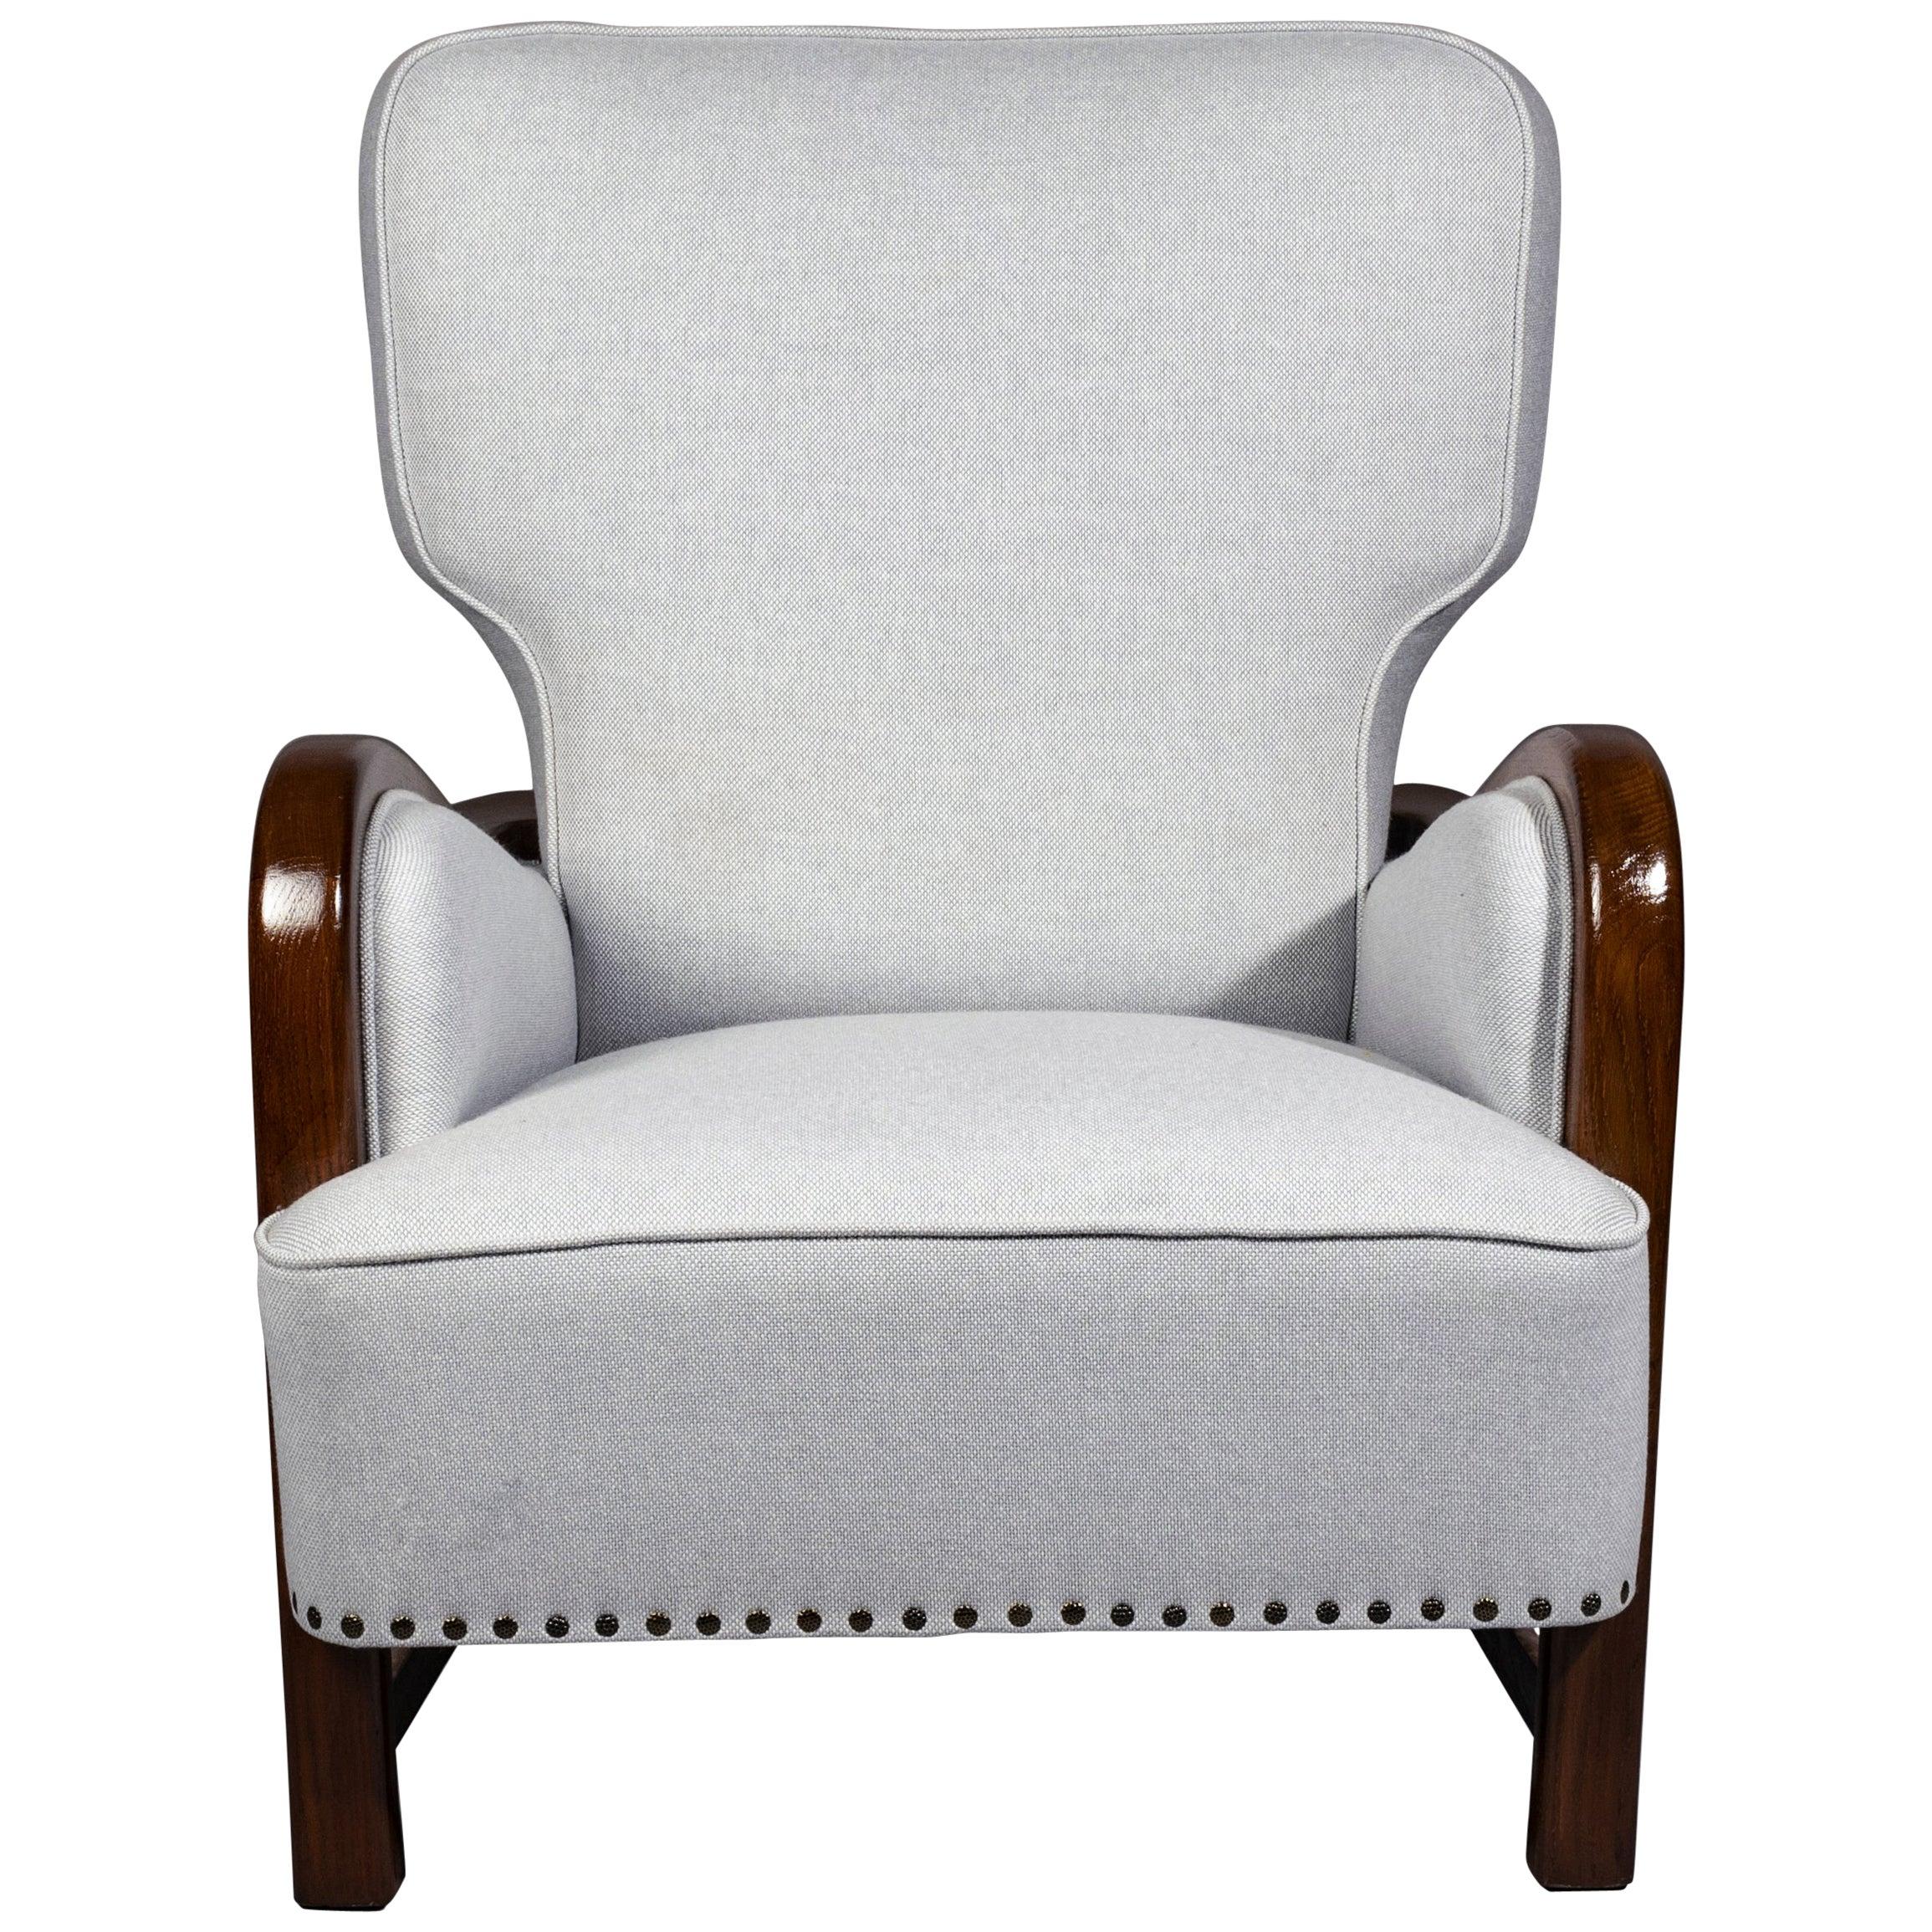 Sculptural Wingback Chair, Denmark, 1940s